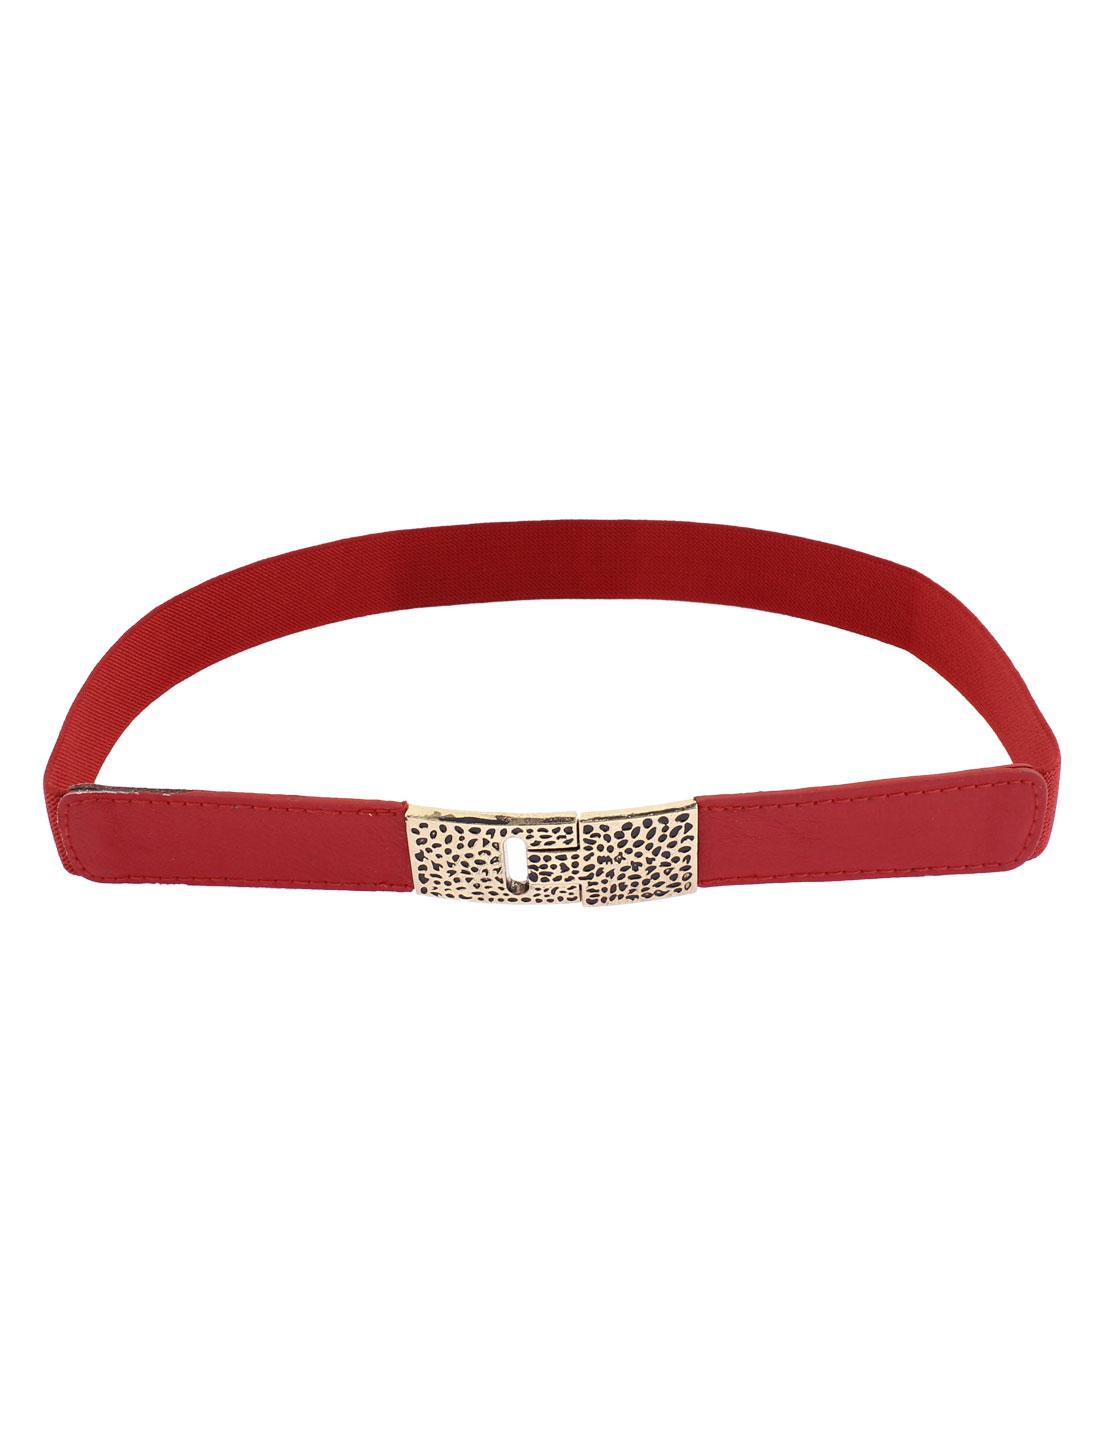 Interlocking Buckle Narrow Waist Belt Waistband 1 Inch Width Red for Lady